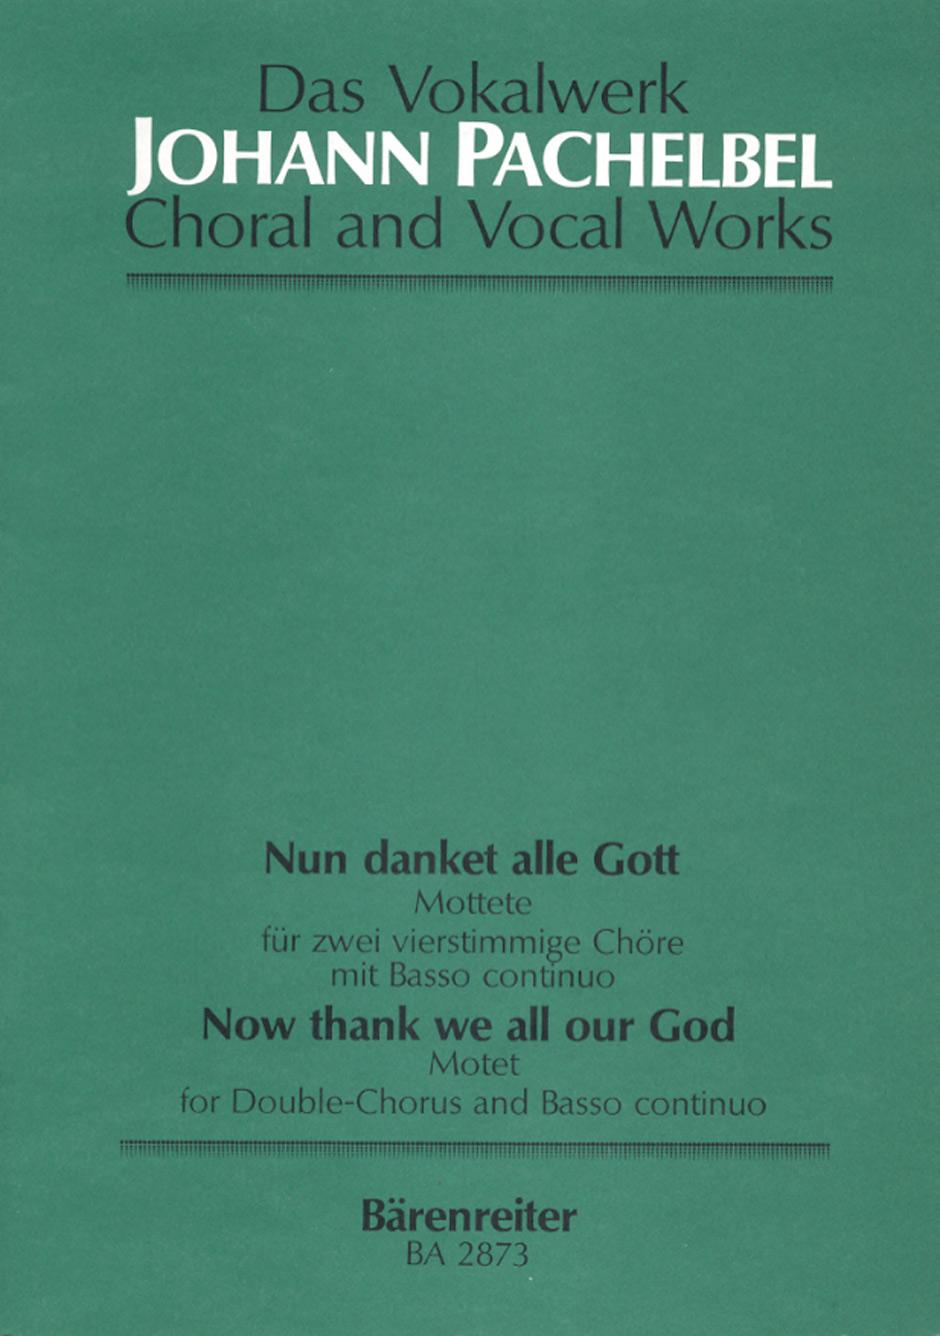 Johann Pachelbel: Nun danket alle Gott: SATB: Score